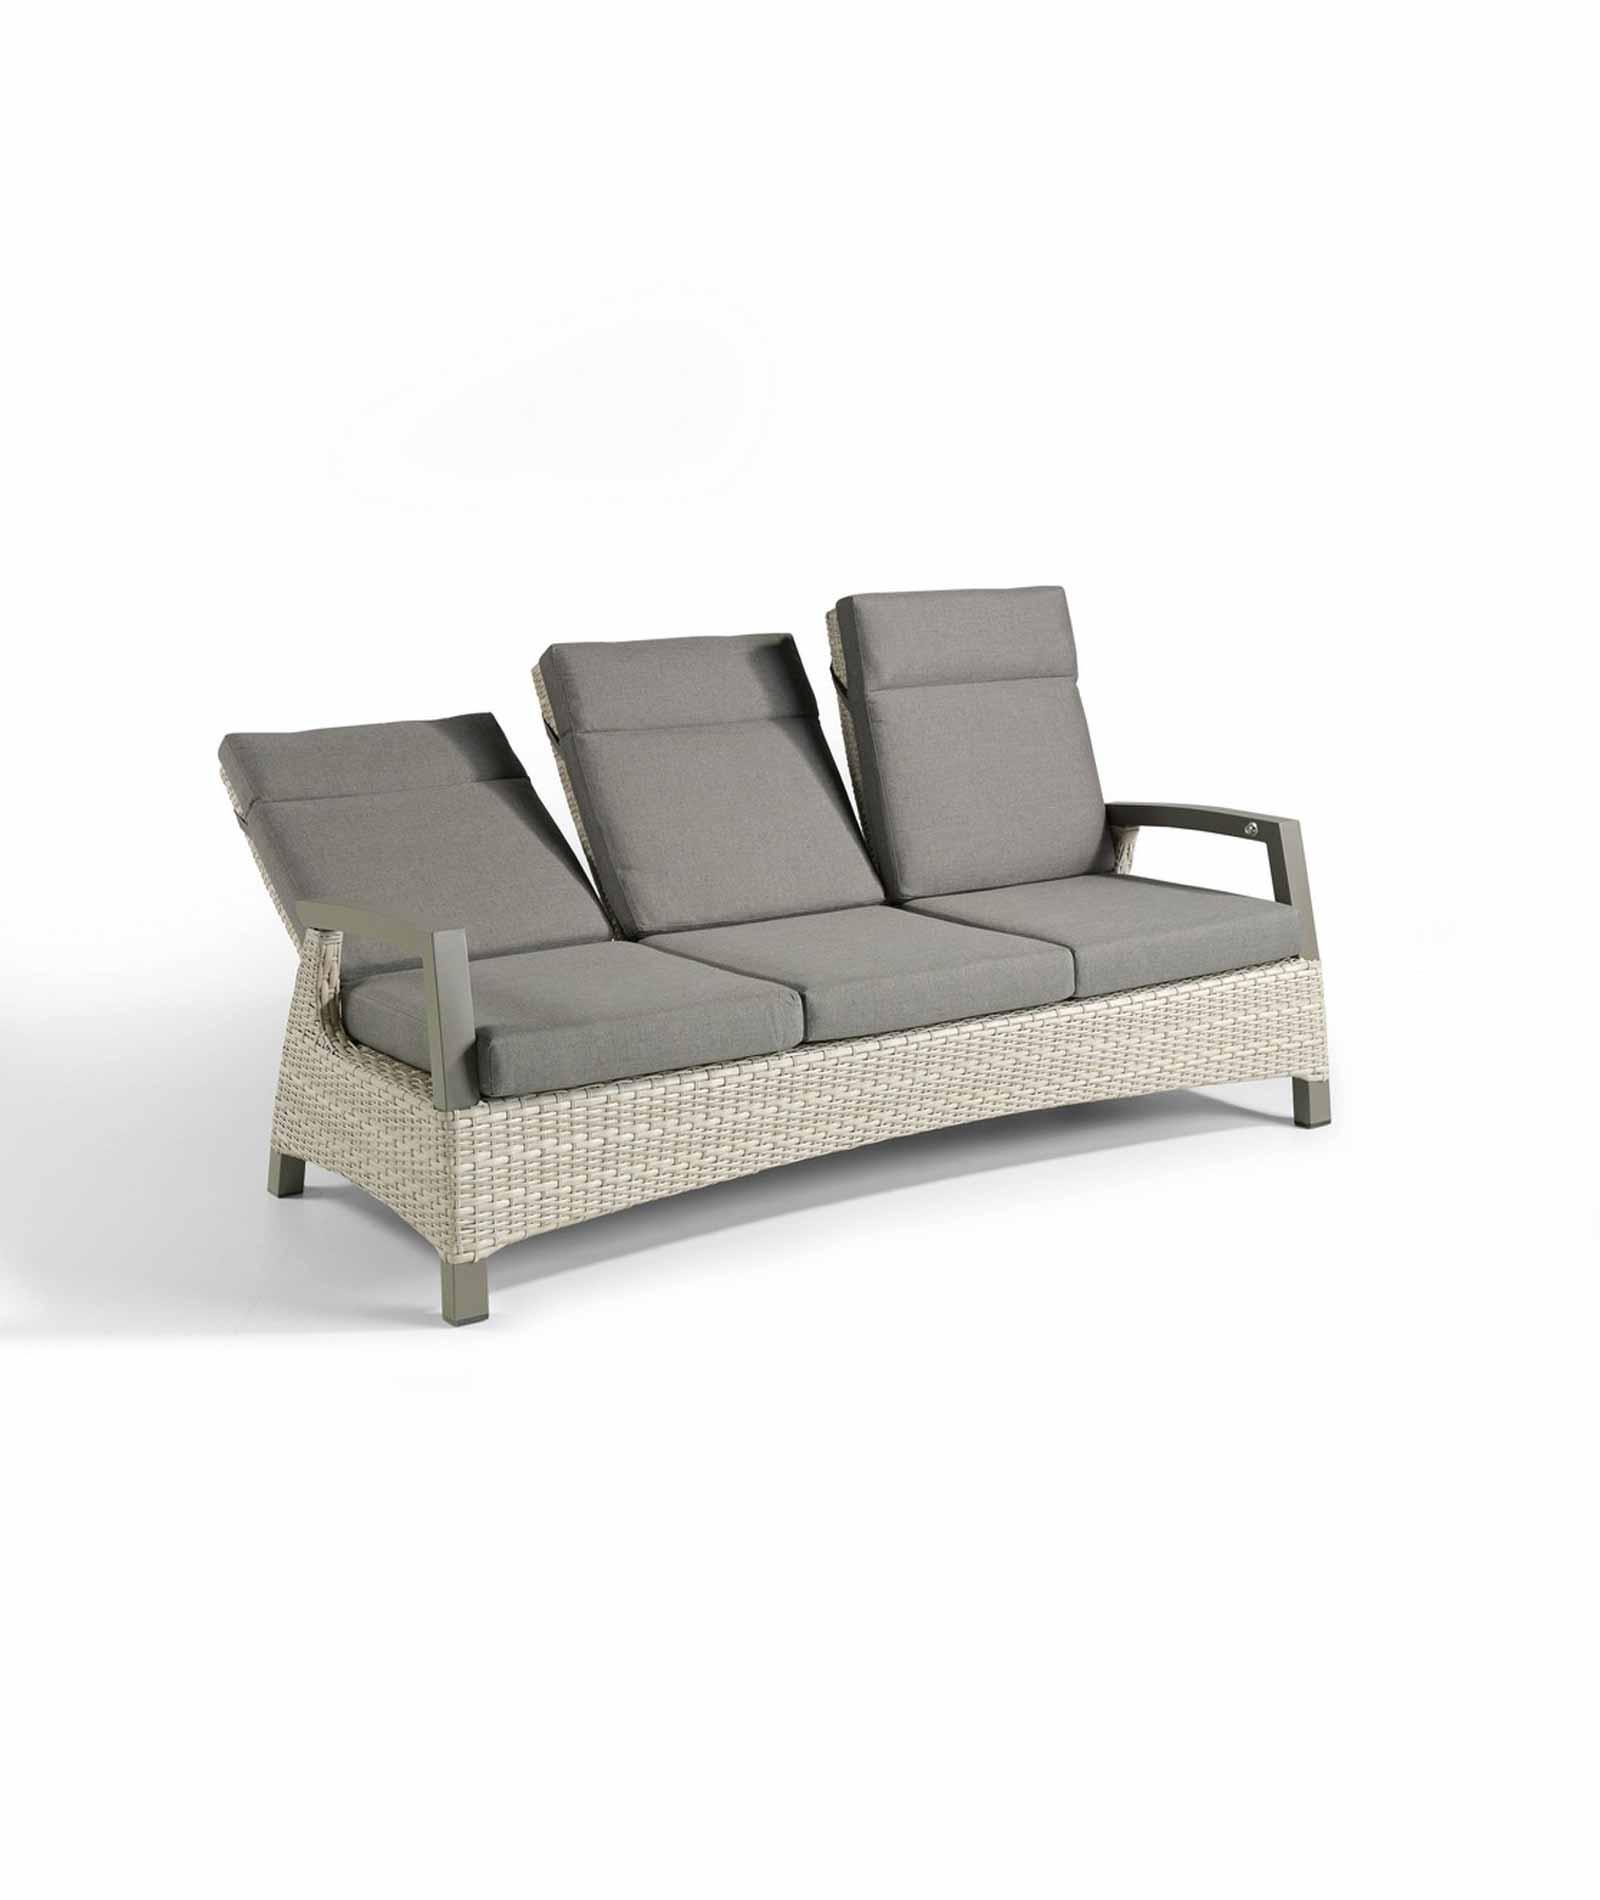 Bowie Sofa Reclinable Terraza Bella